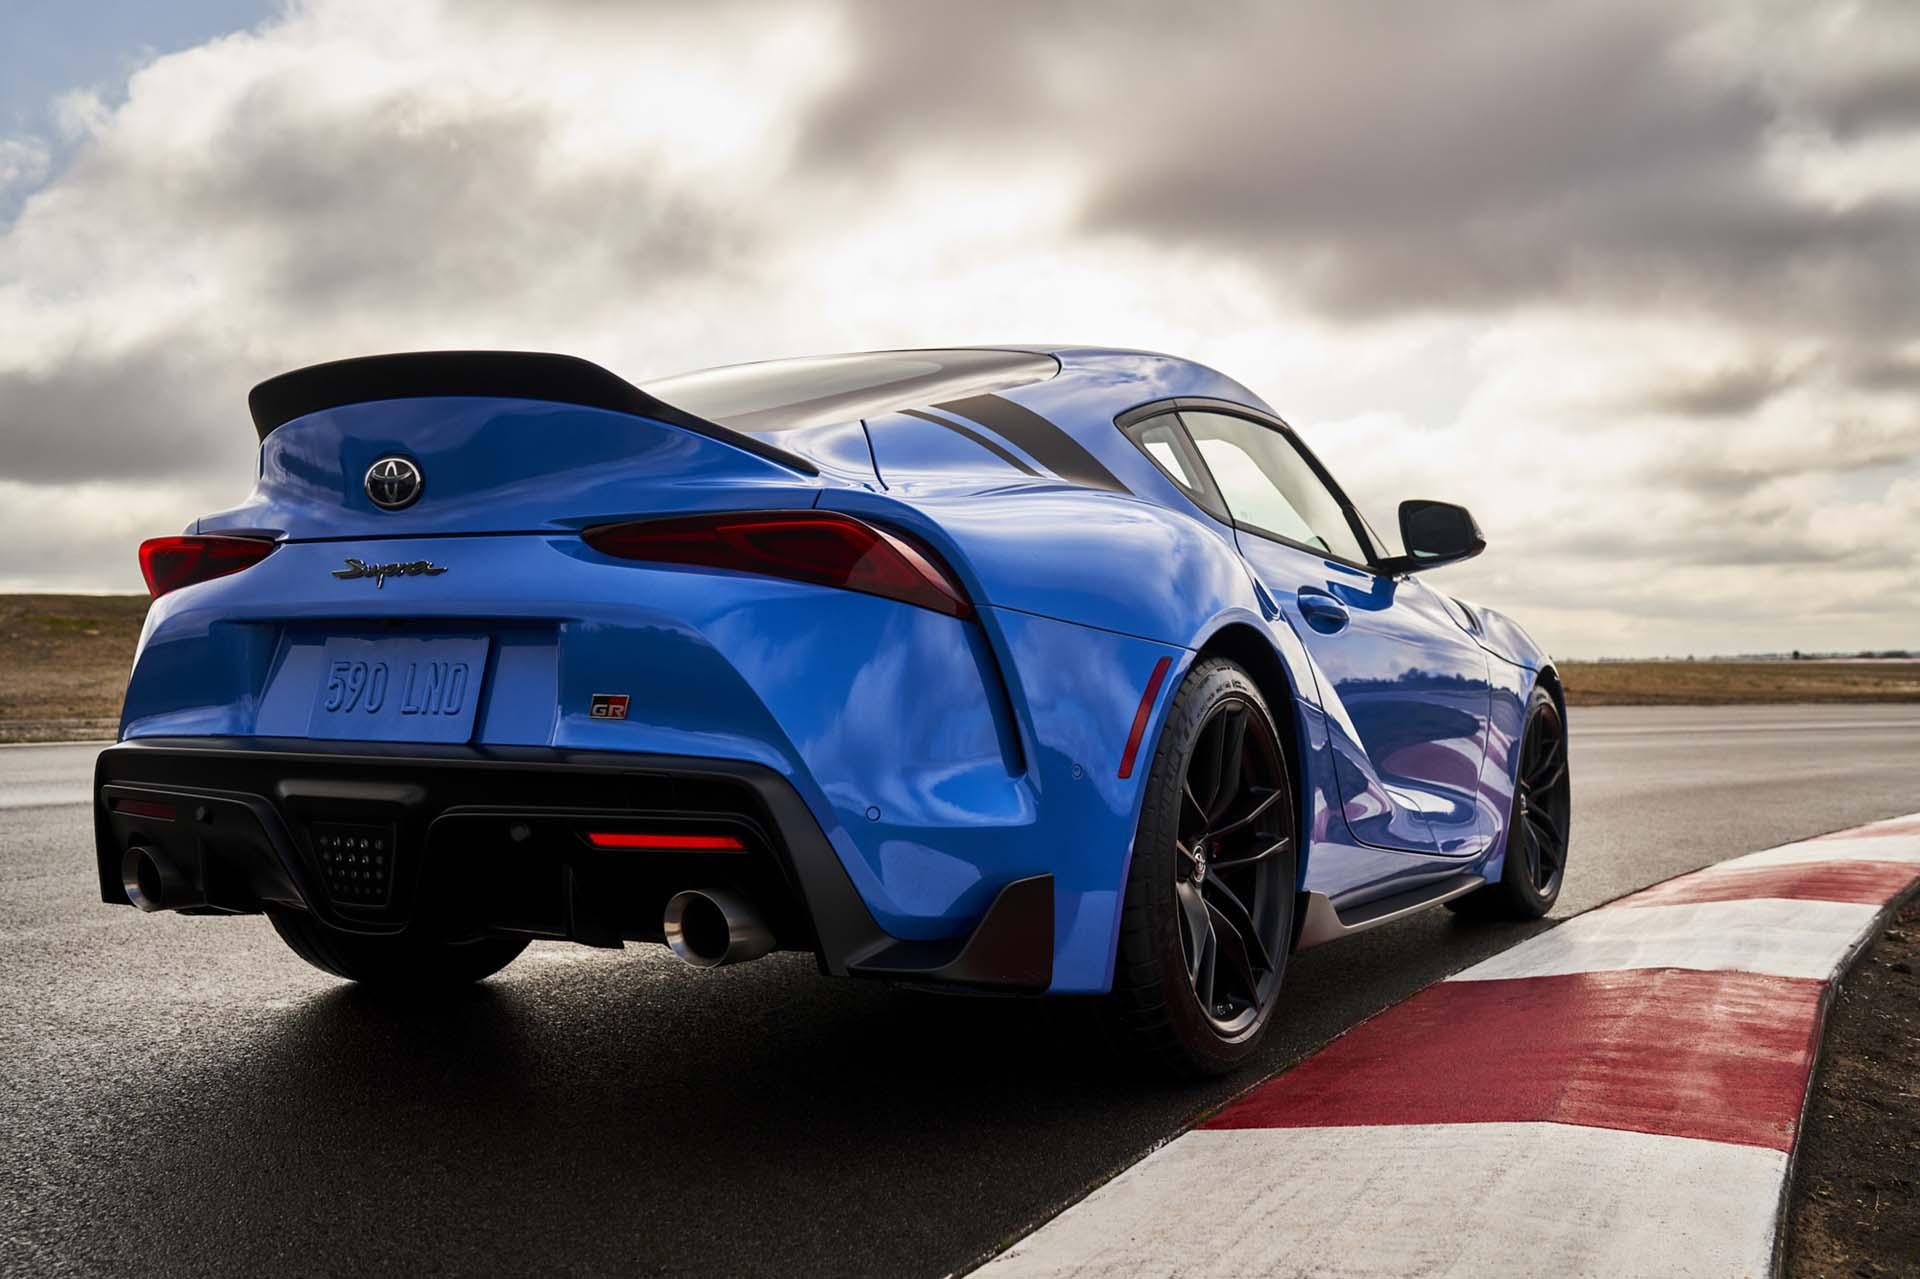 2021 VW ID 4, 2021 Toyota Supra, 2020 Mercedes-AMG F1 racer: Car News Headlines